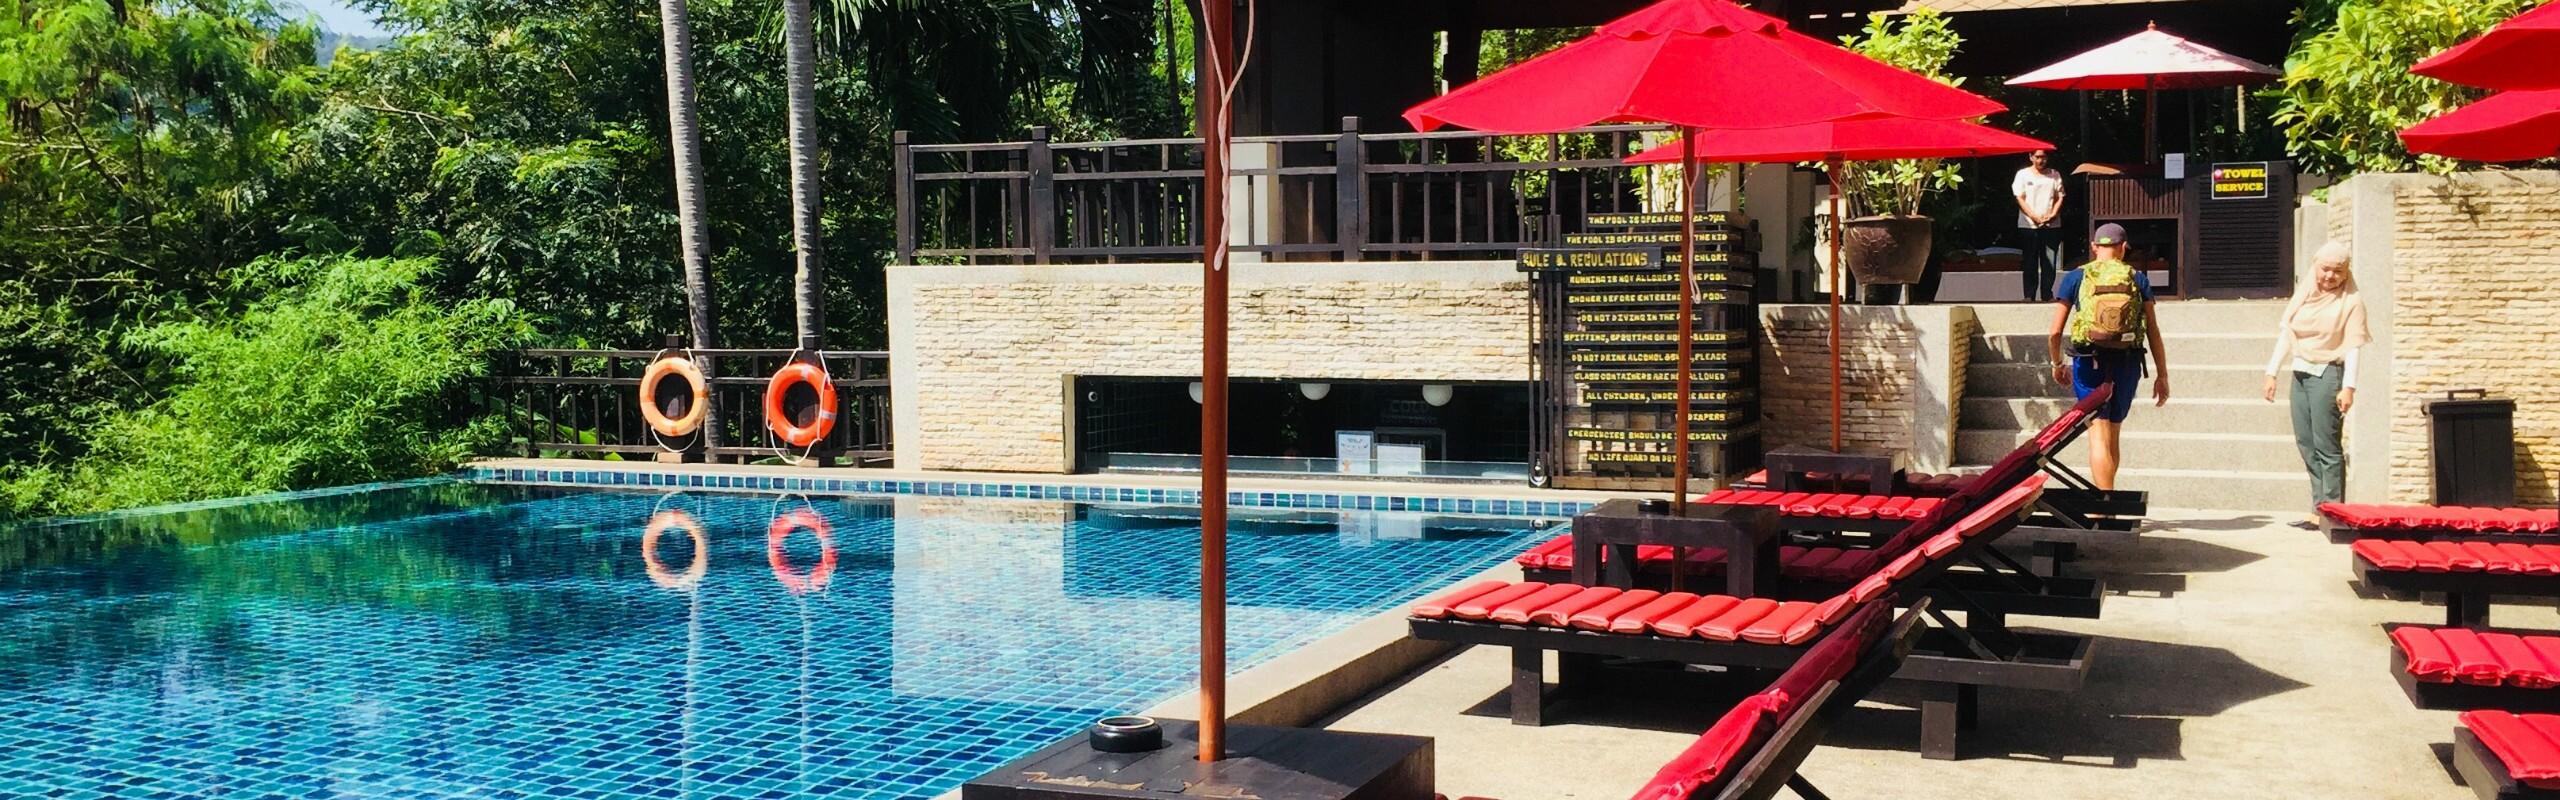 Choosing a Hotel in Koh Samui